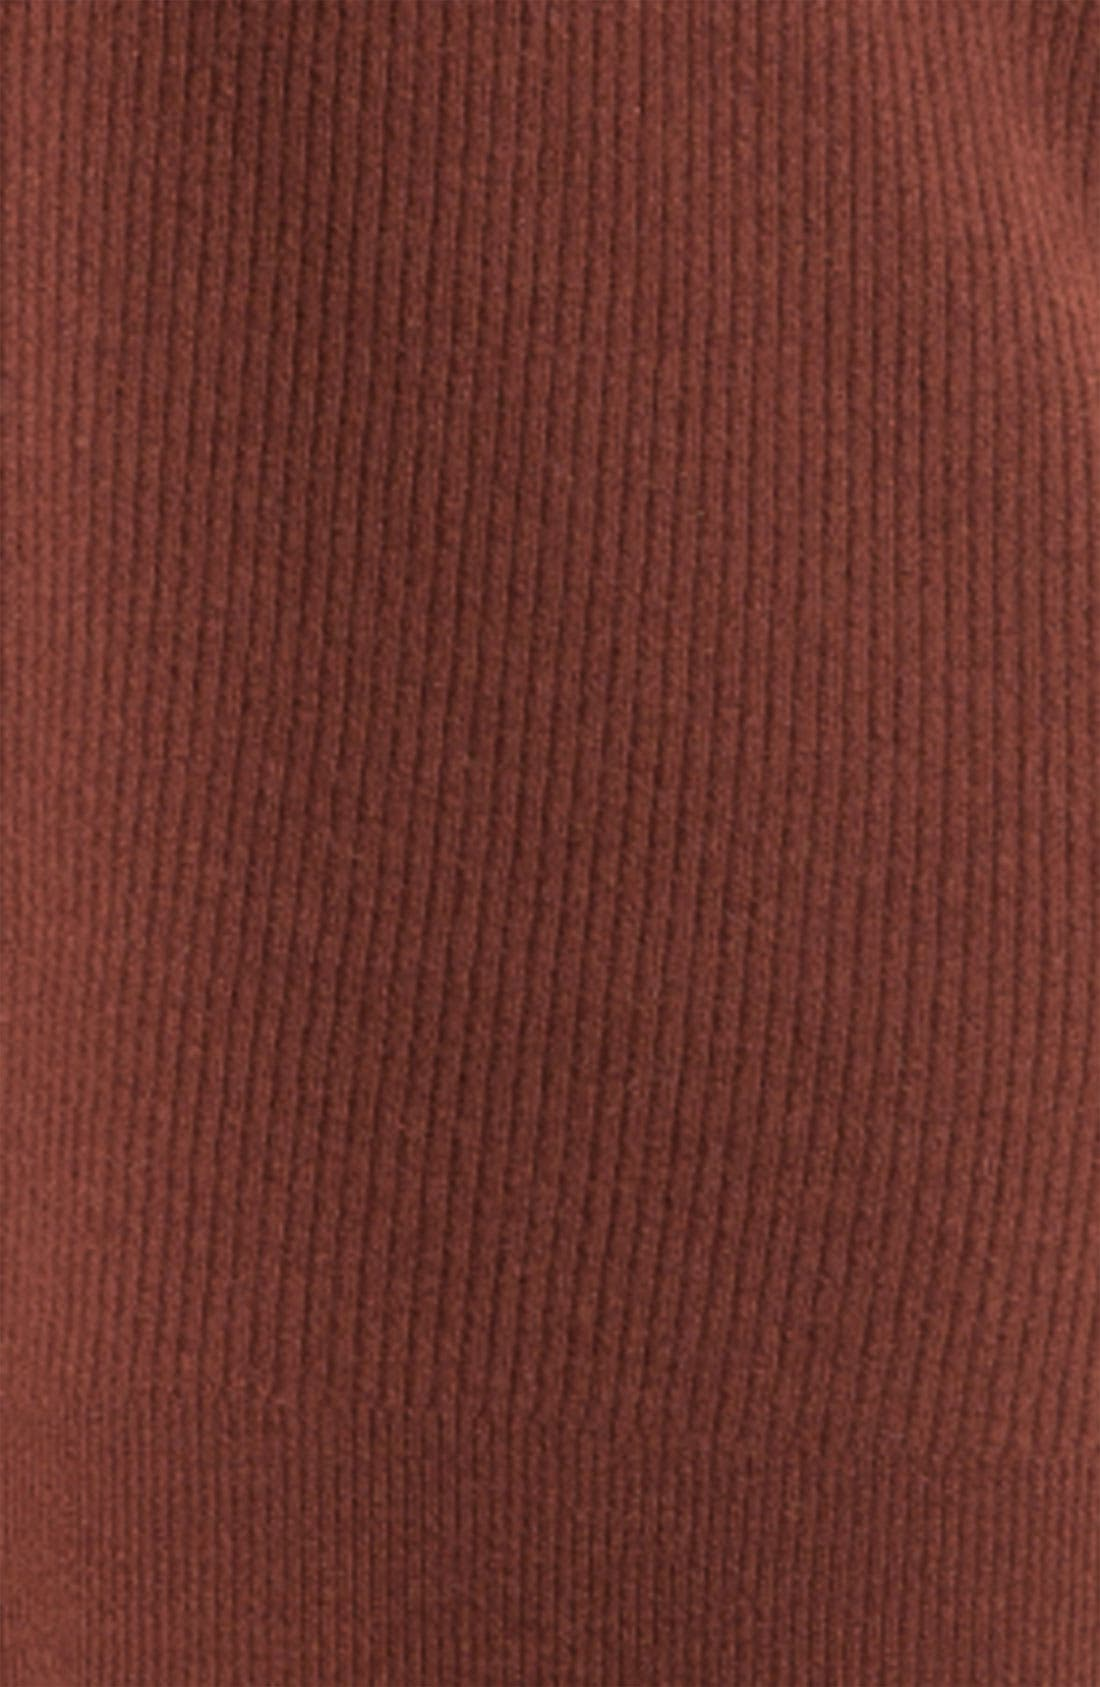 Alternate Image 3  - Vince Ribbed Sweater Dress